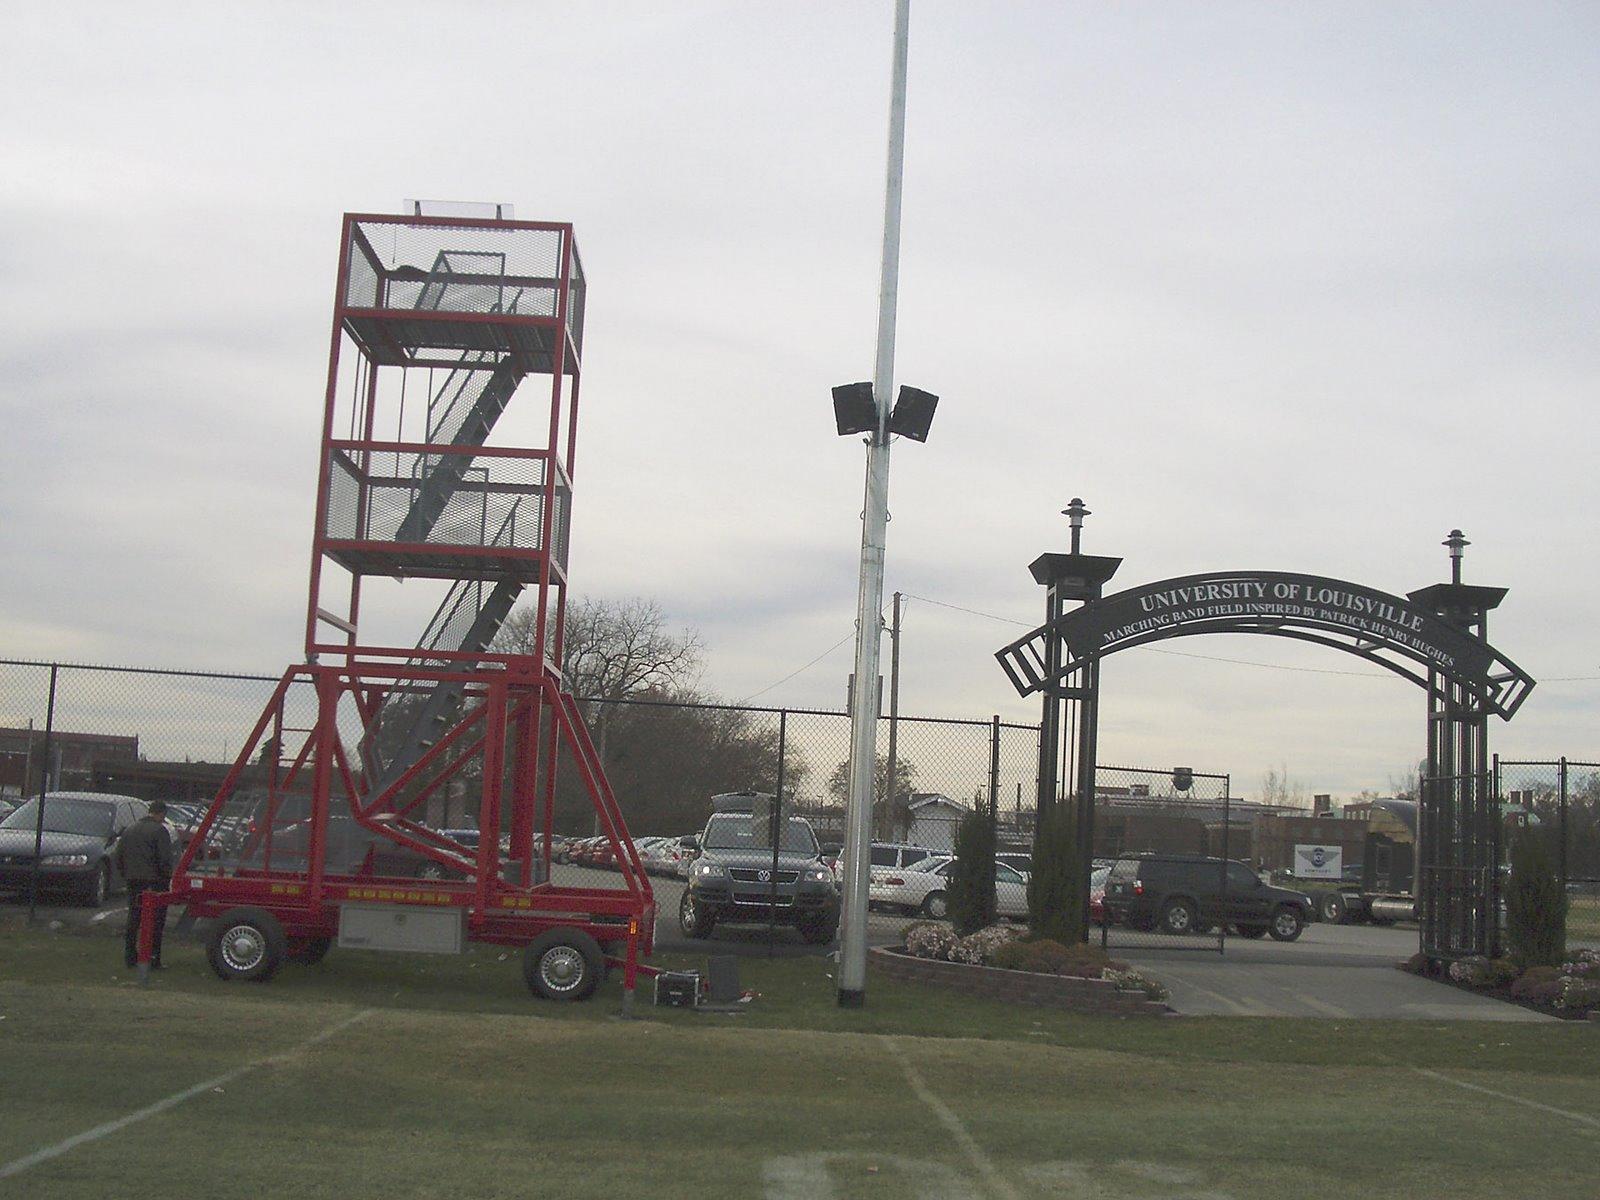 Technomad Turnkey PA System Installation t the University of Louisville in Kentucky.